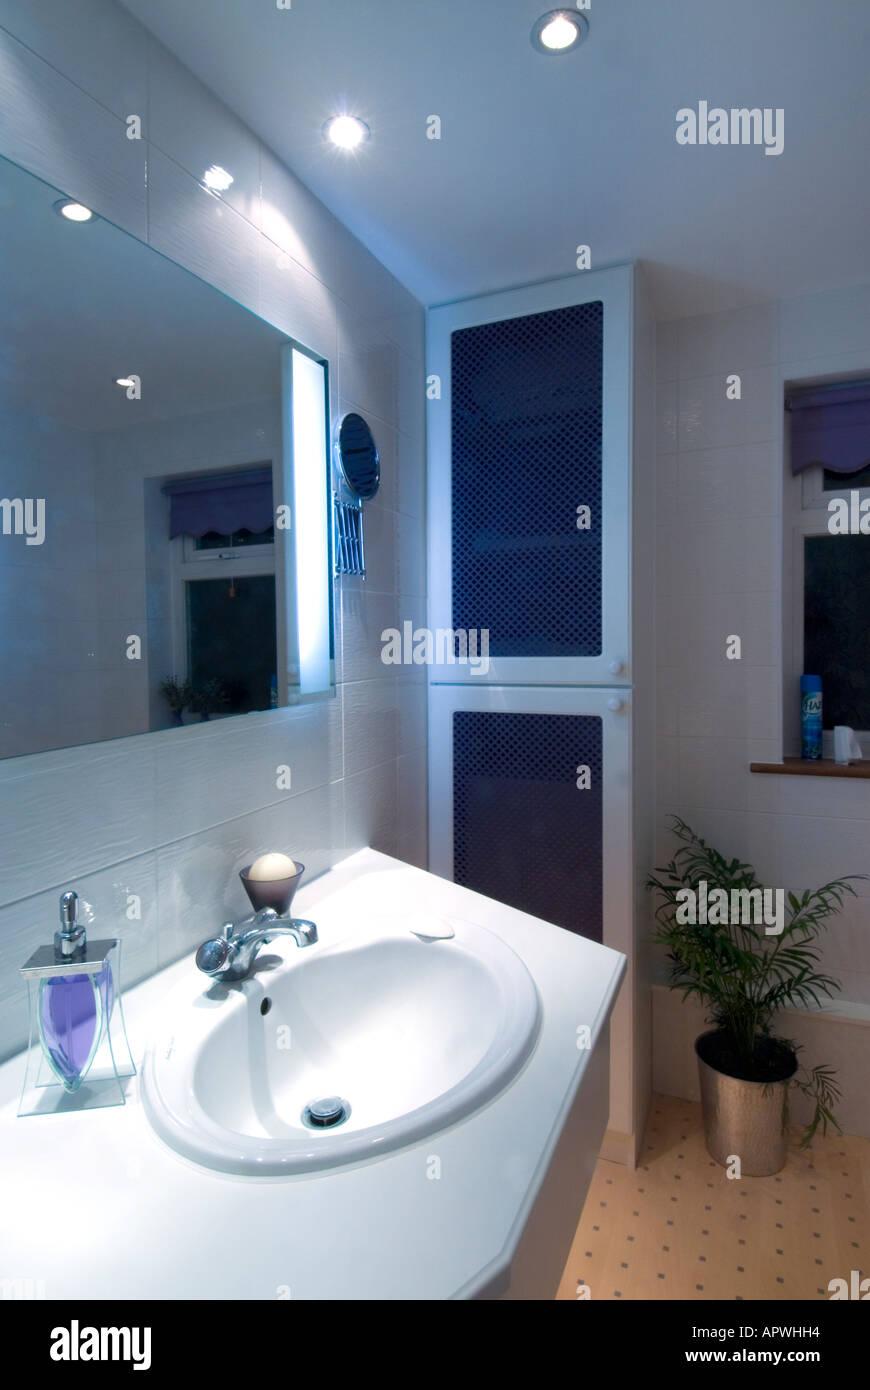 domestic house bathroom vanity unit and hand basin includes, Bathroom decor